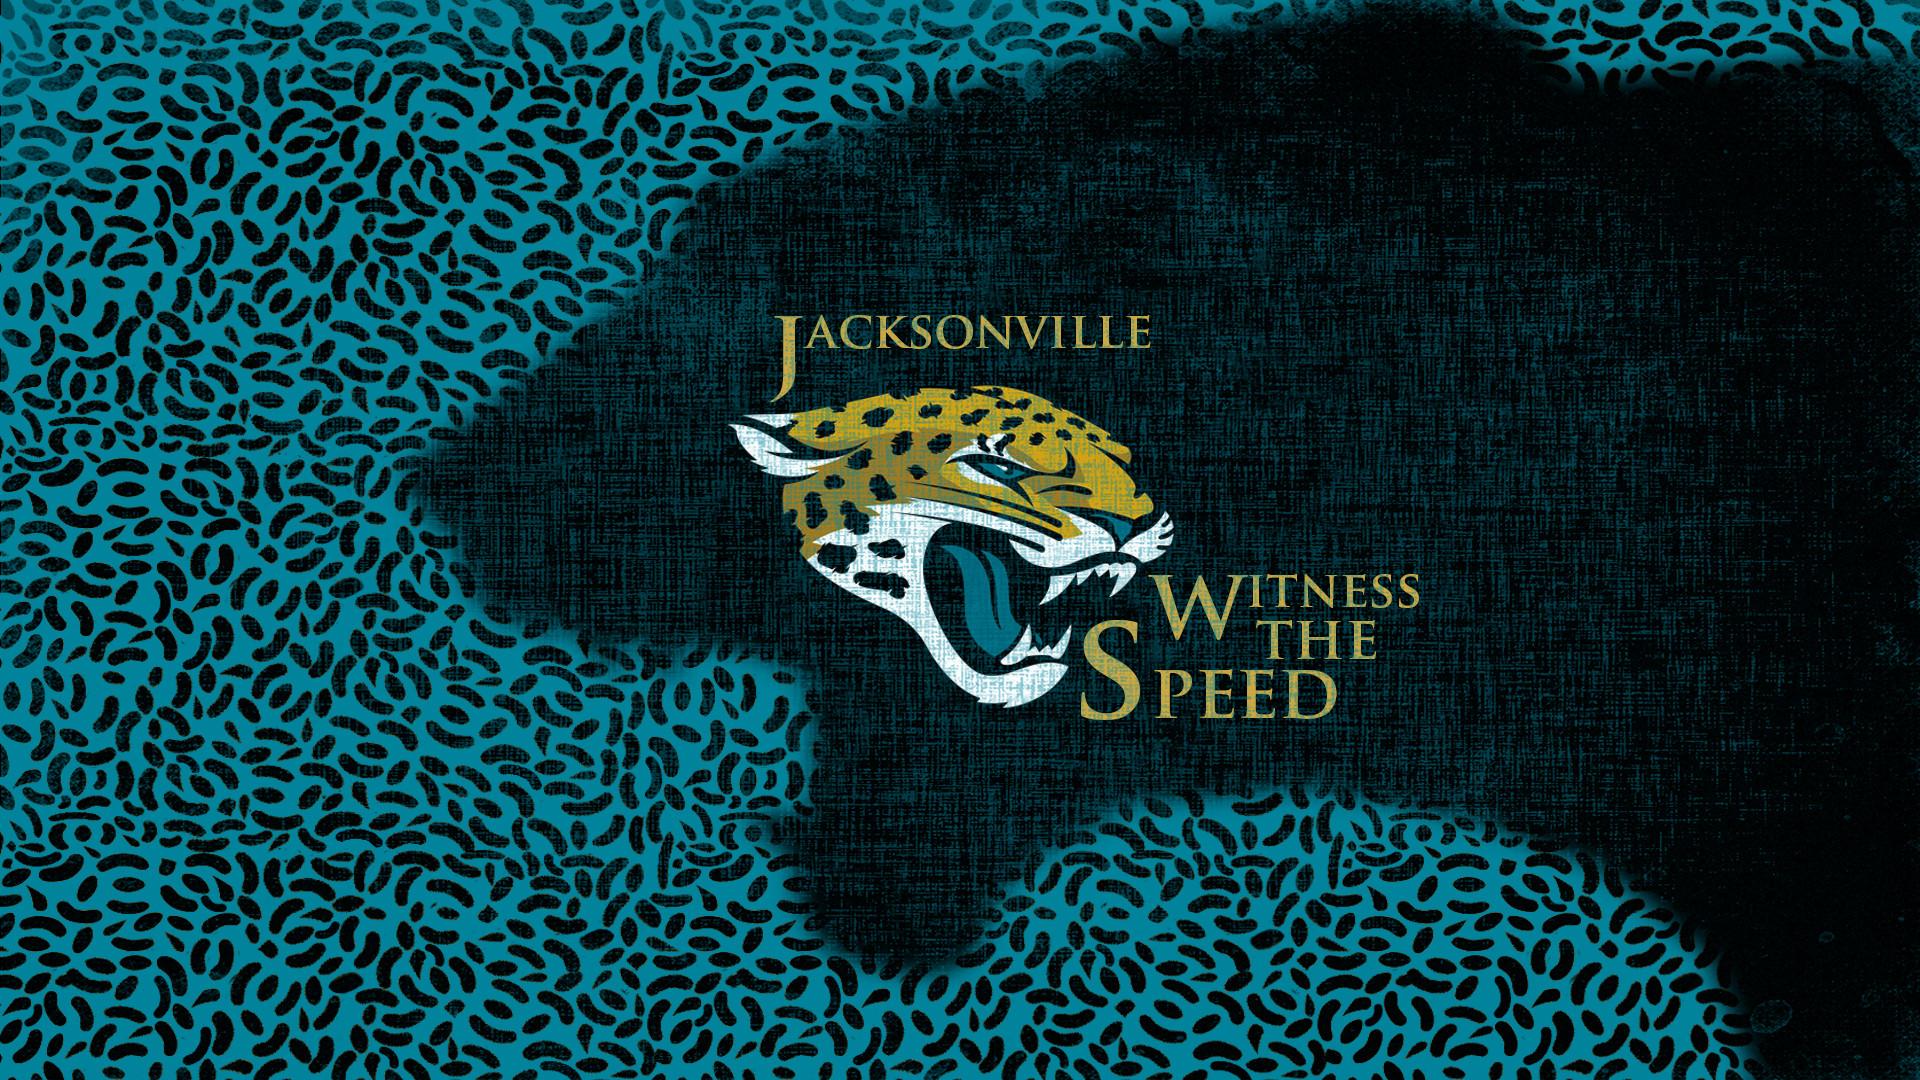 jacksonville jaguars 2017 wallpaper - photo #8